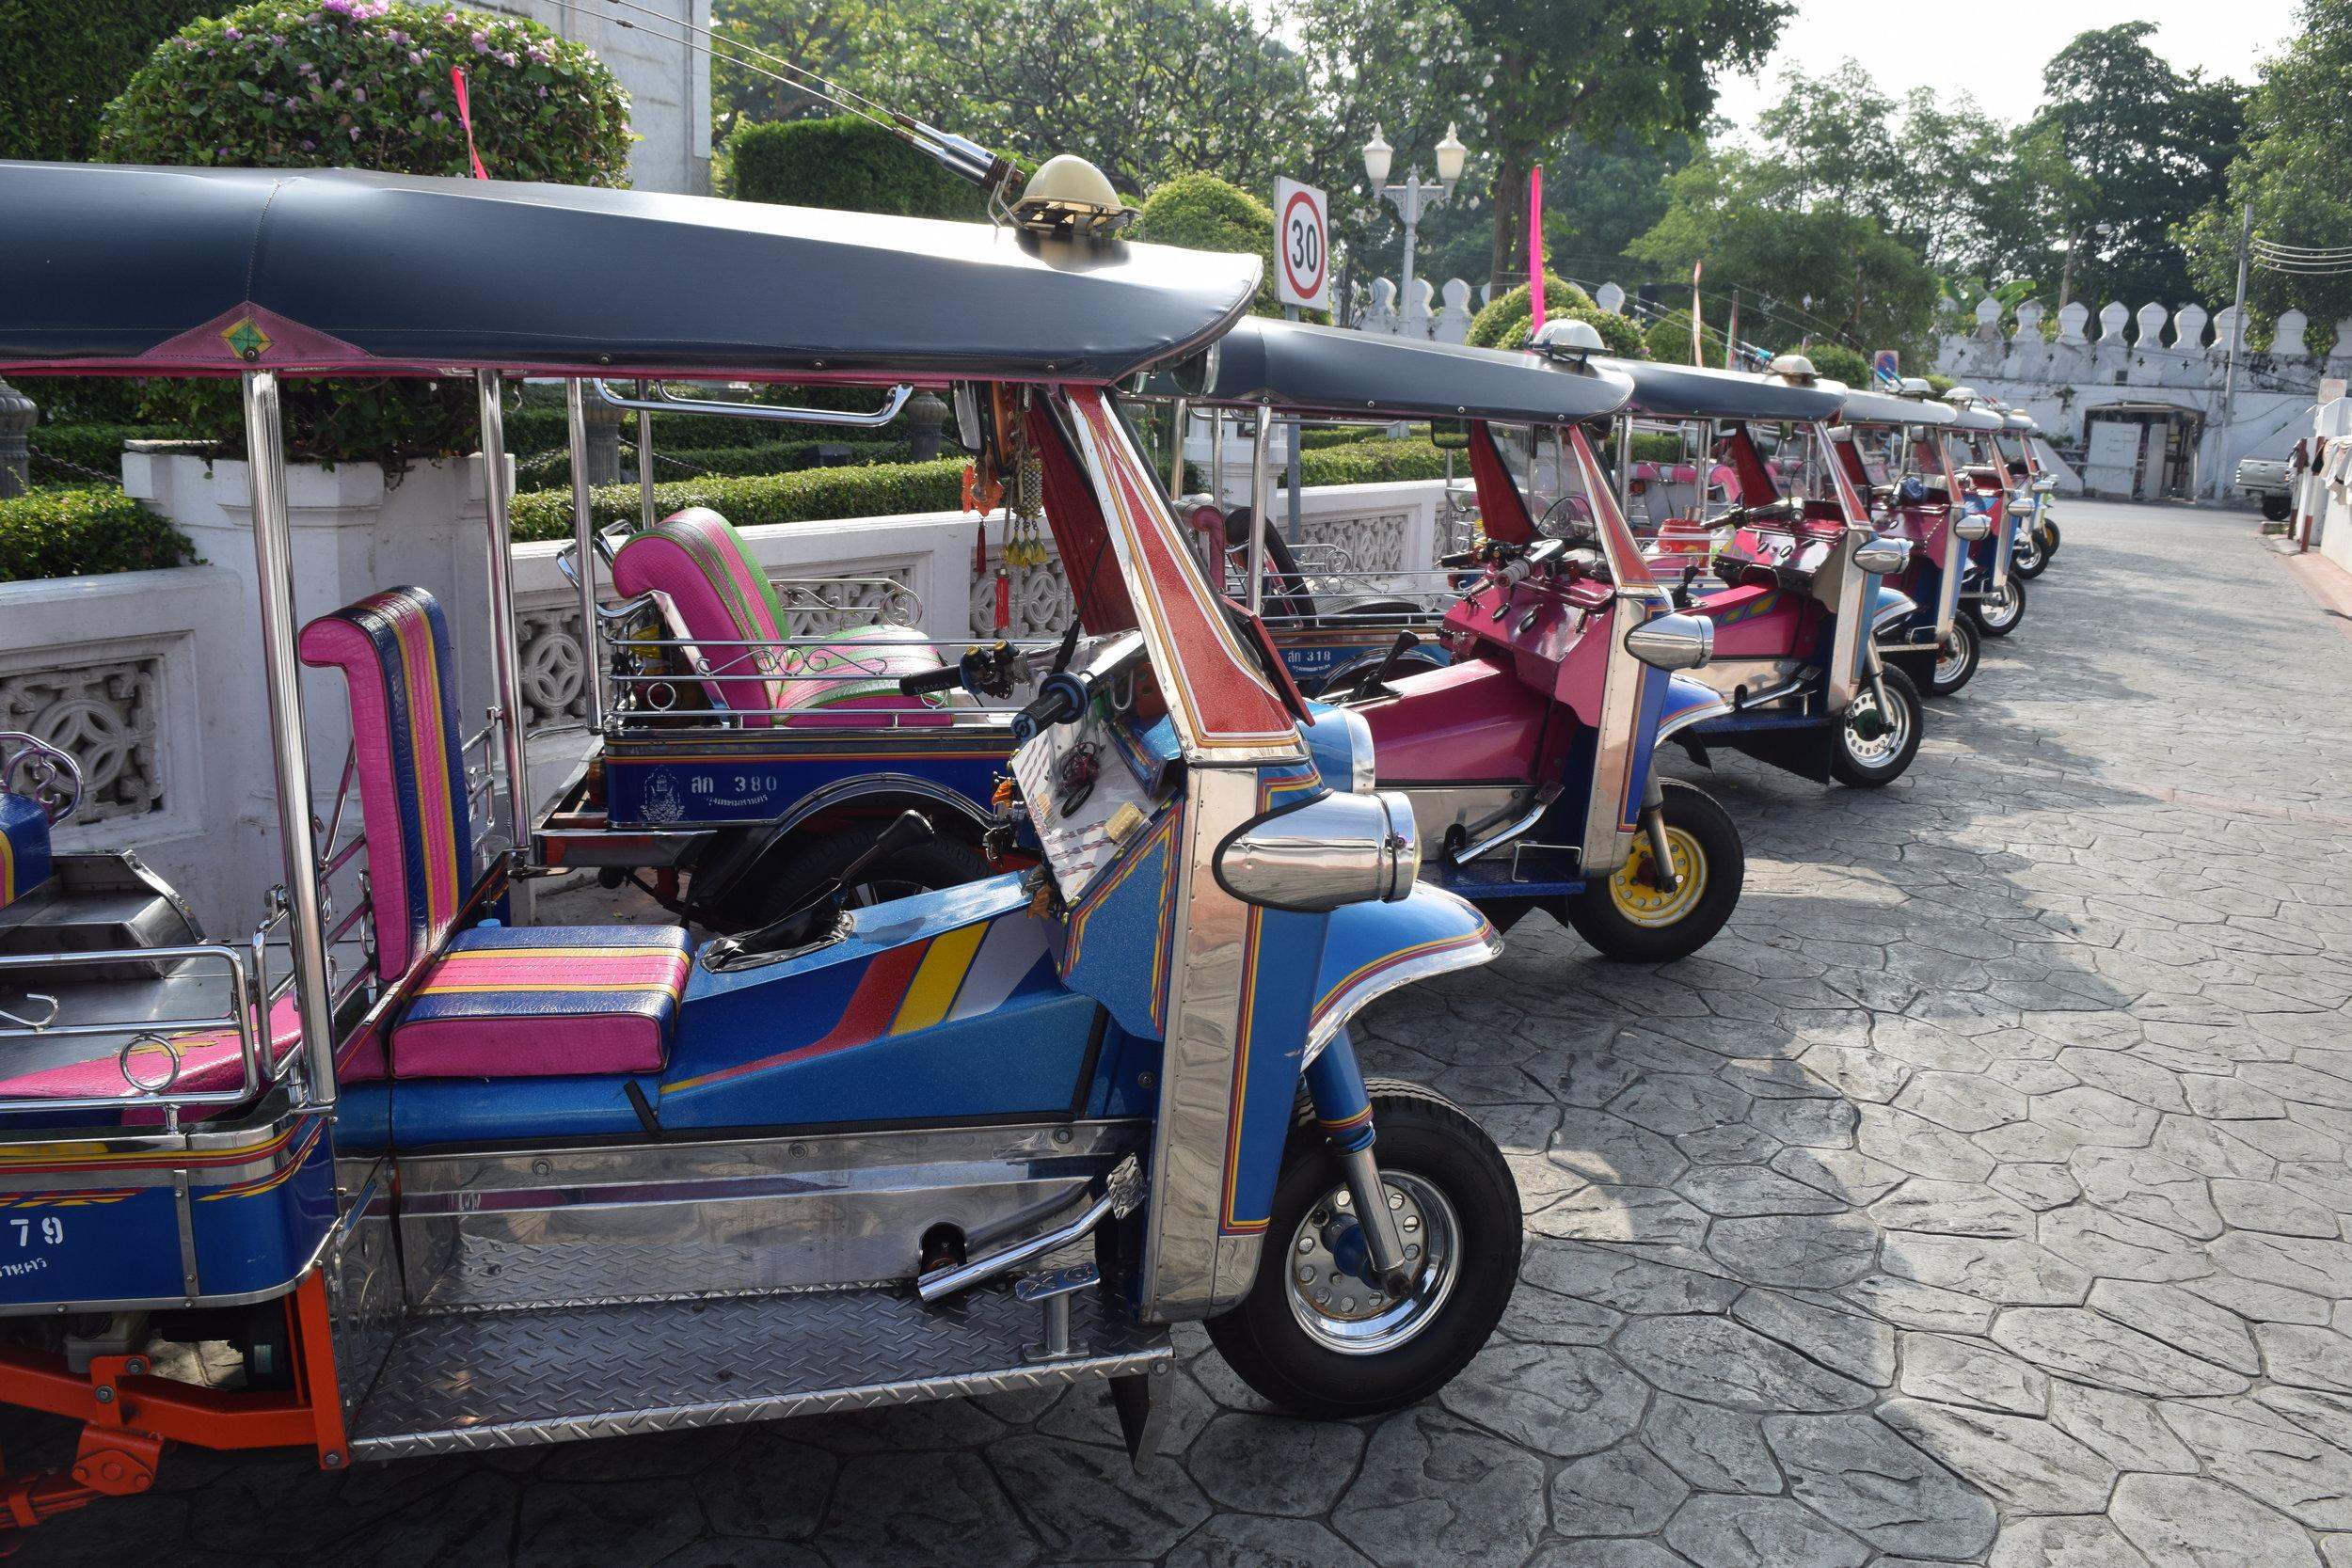 I famigerati Tuk Tuk di Bangkok.